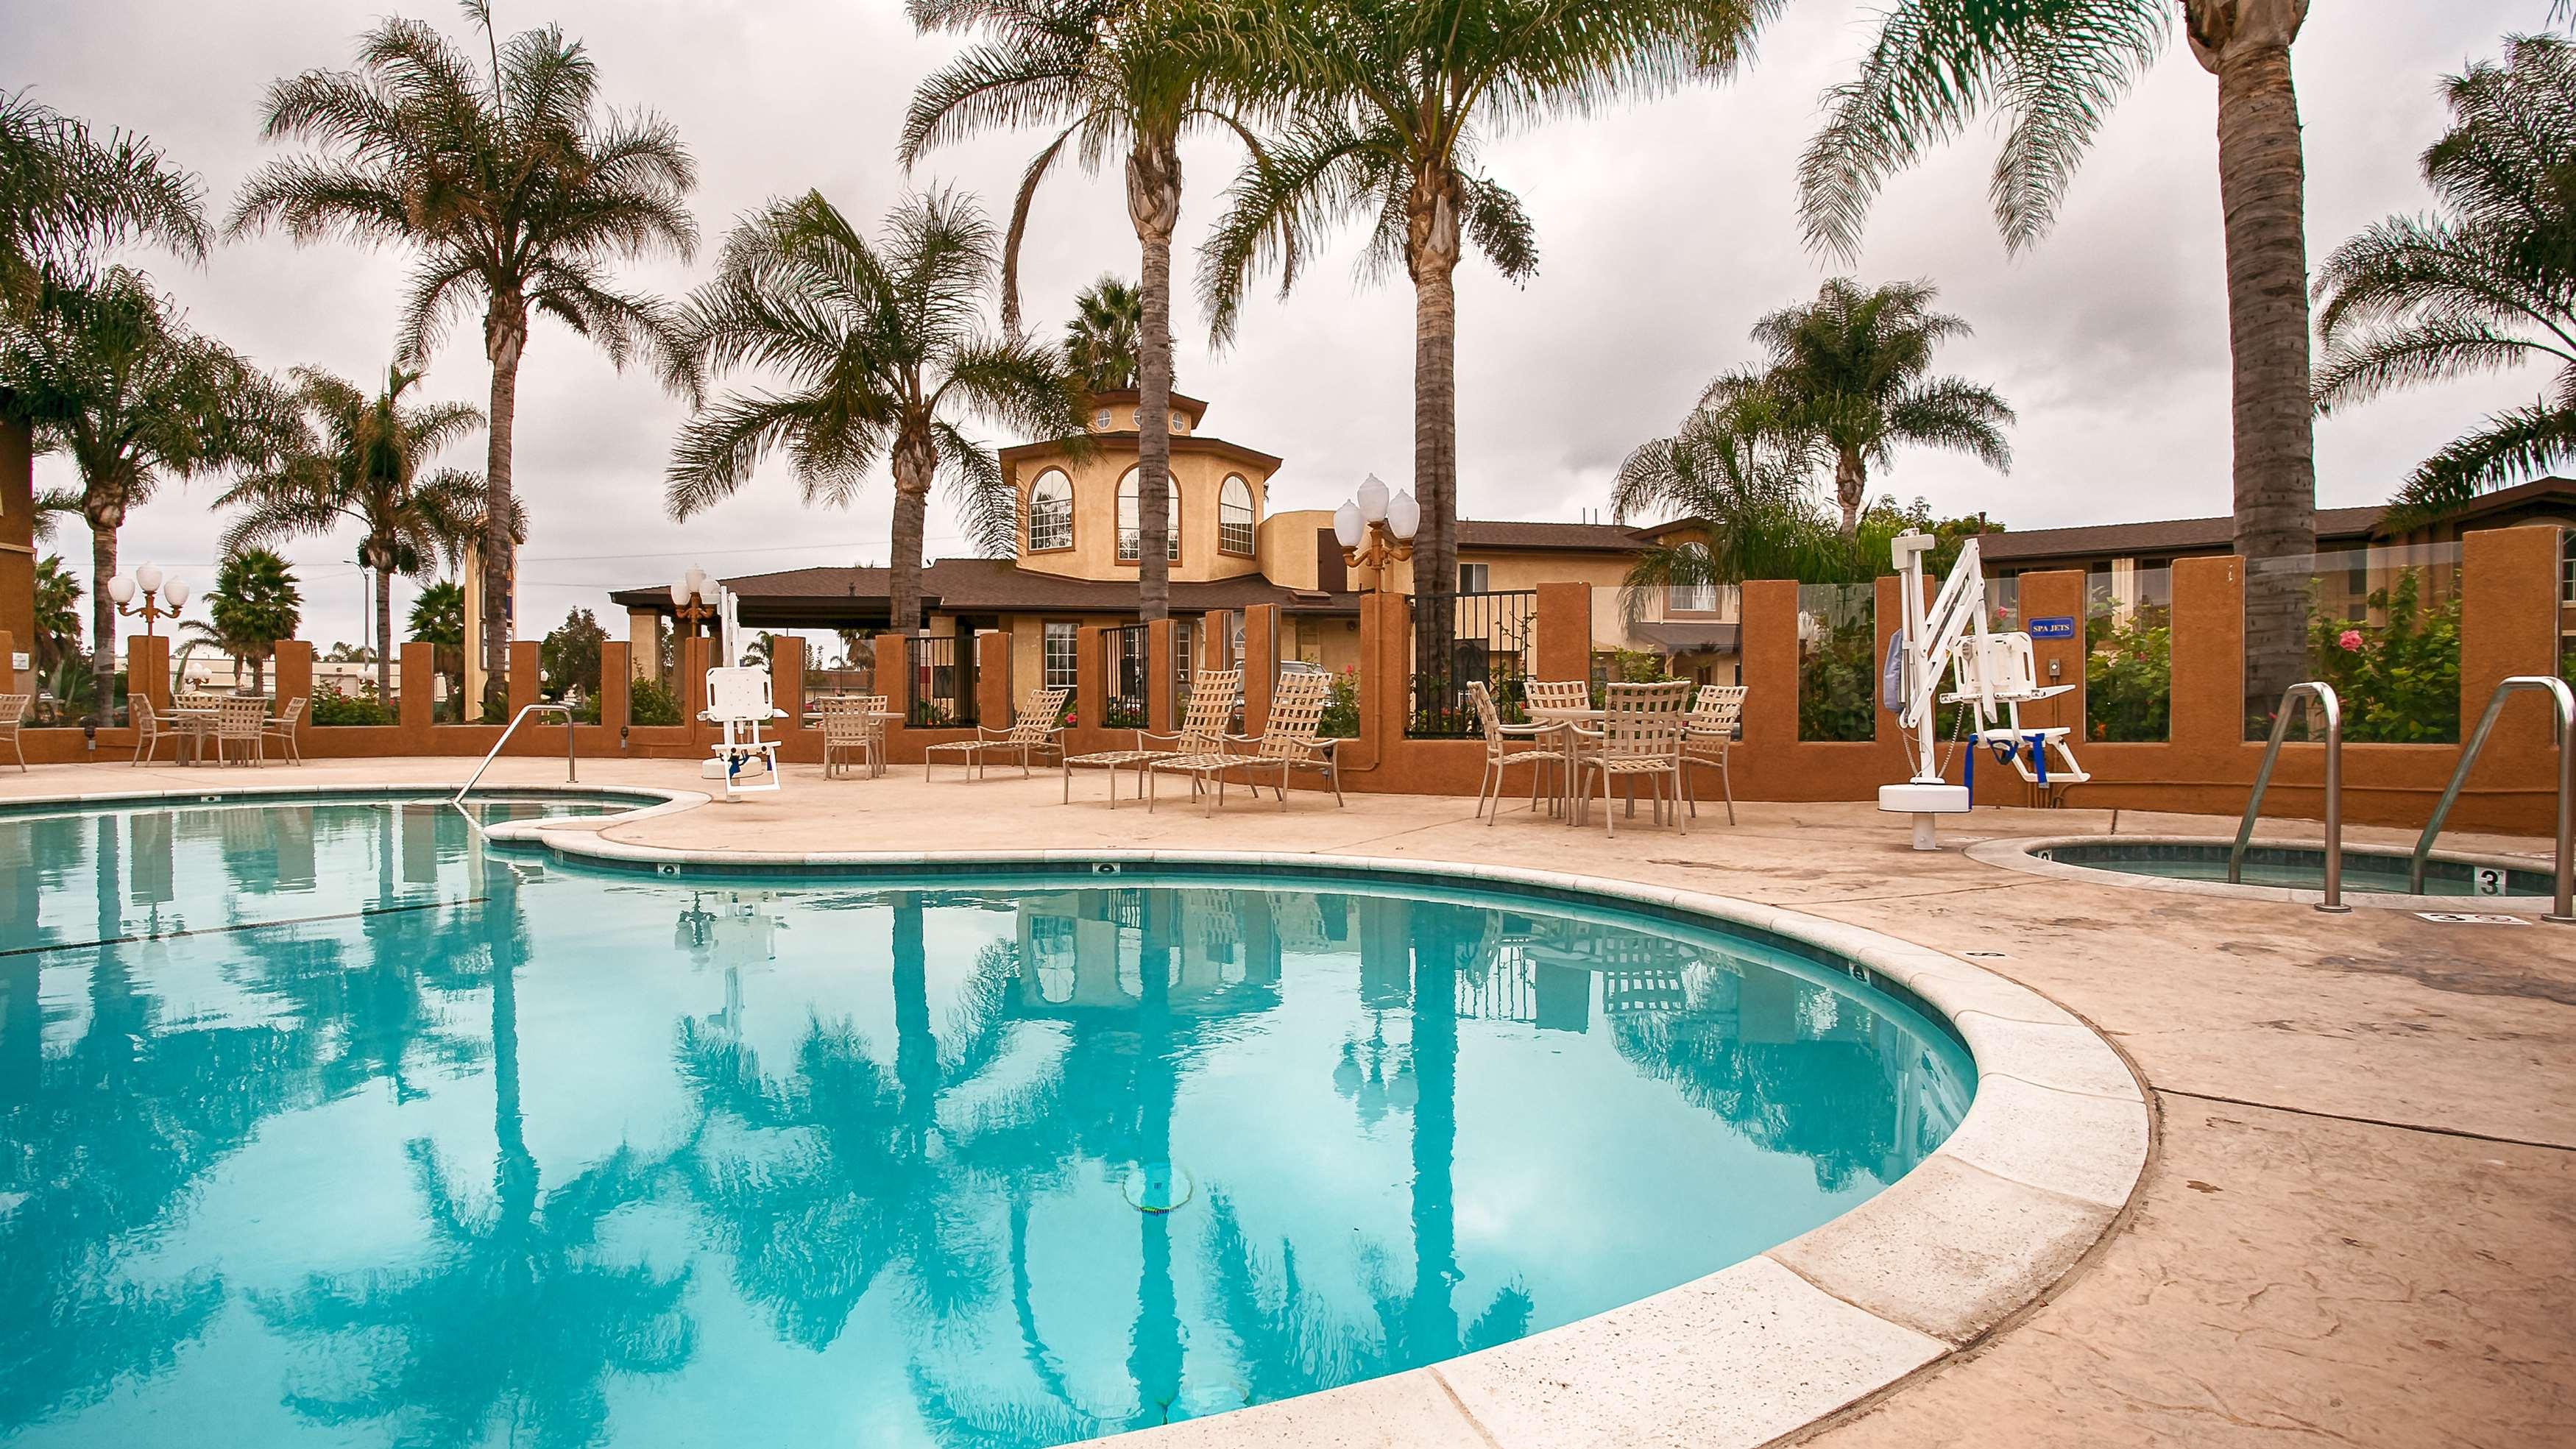 Best Western Oxnard Inn image 3